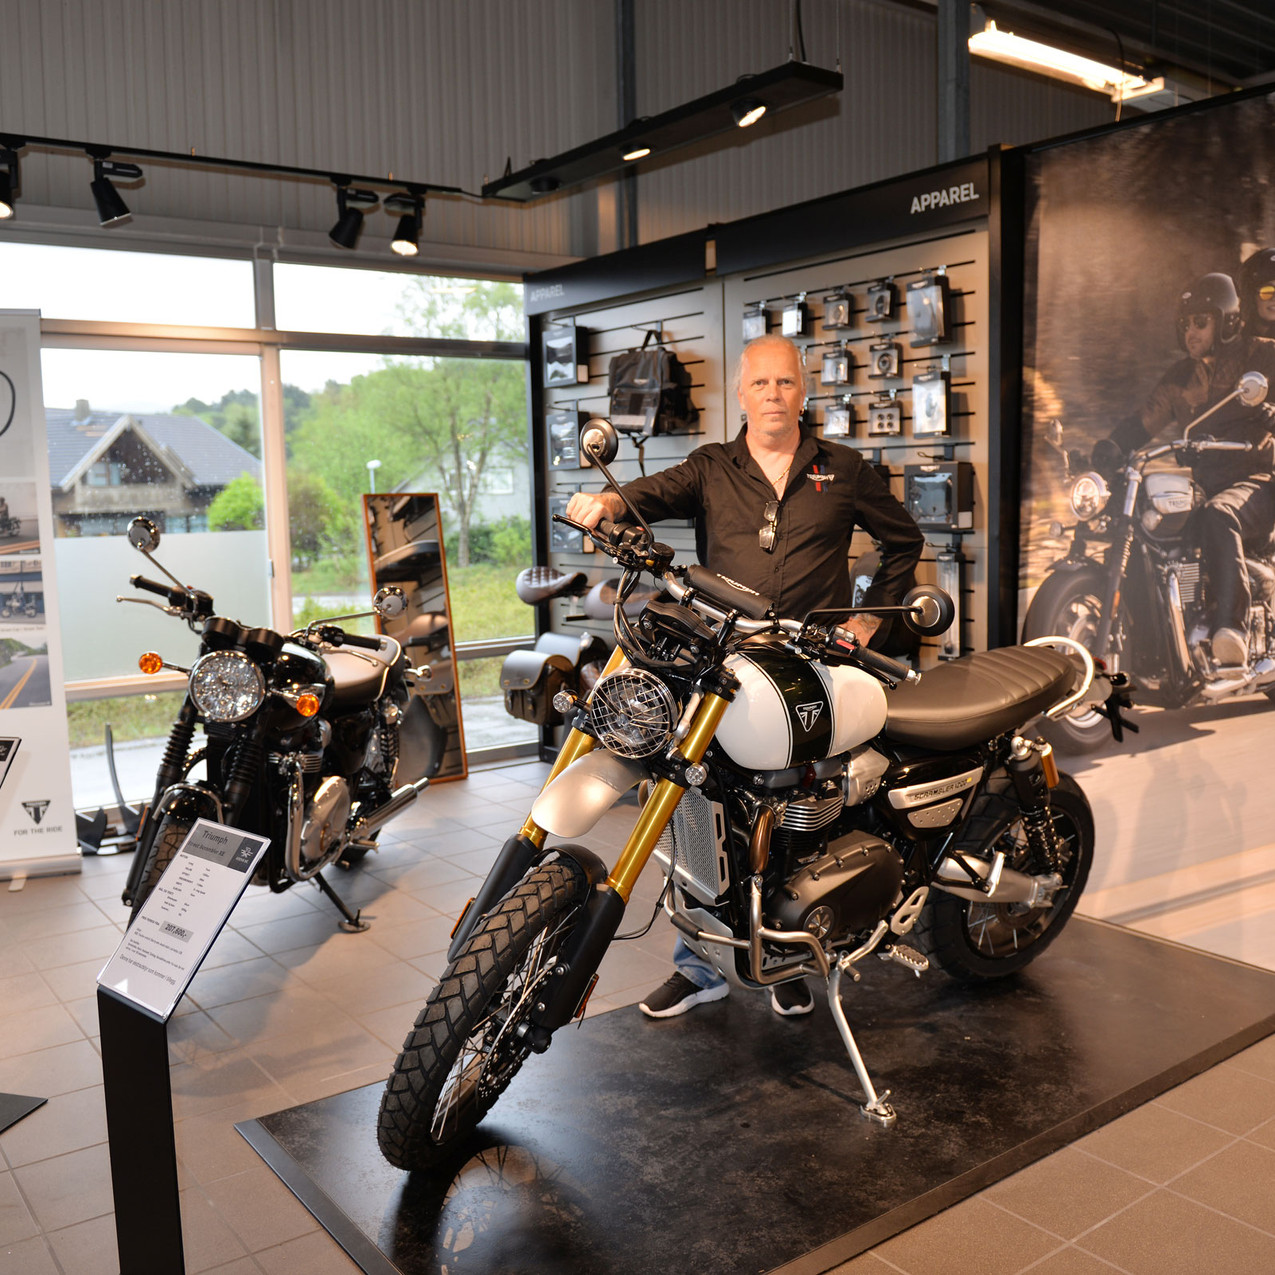 Tommy Victorén var kommet fra Triumph Scandinavia for å vise MC-kunder årets Triumph-utvalg. Her bak nyheten Triumph Scrambler.